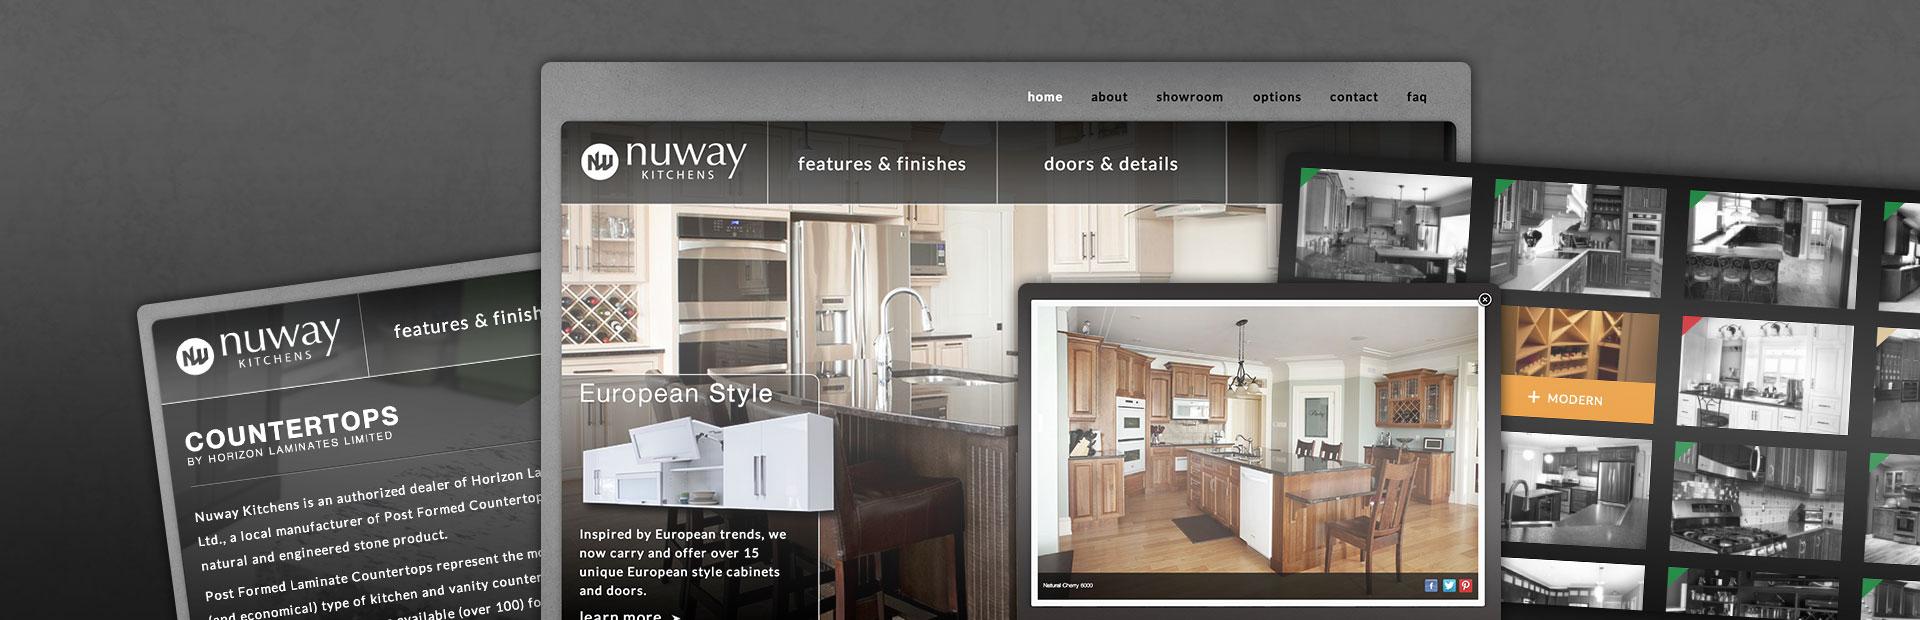 Nu look nu website nuway kitchens dc design house - Nu look home design ...